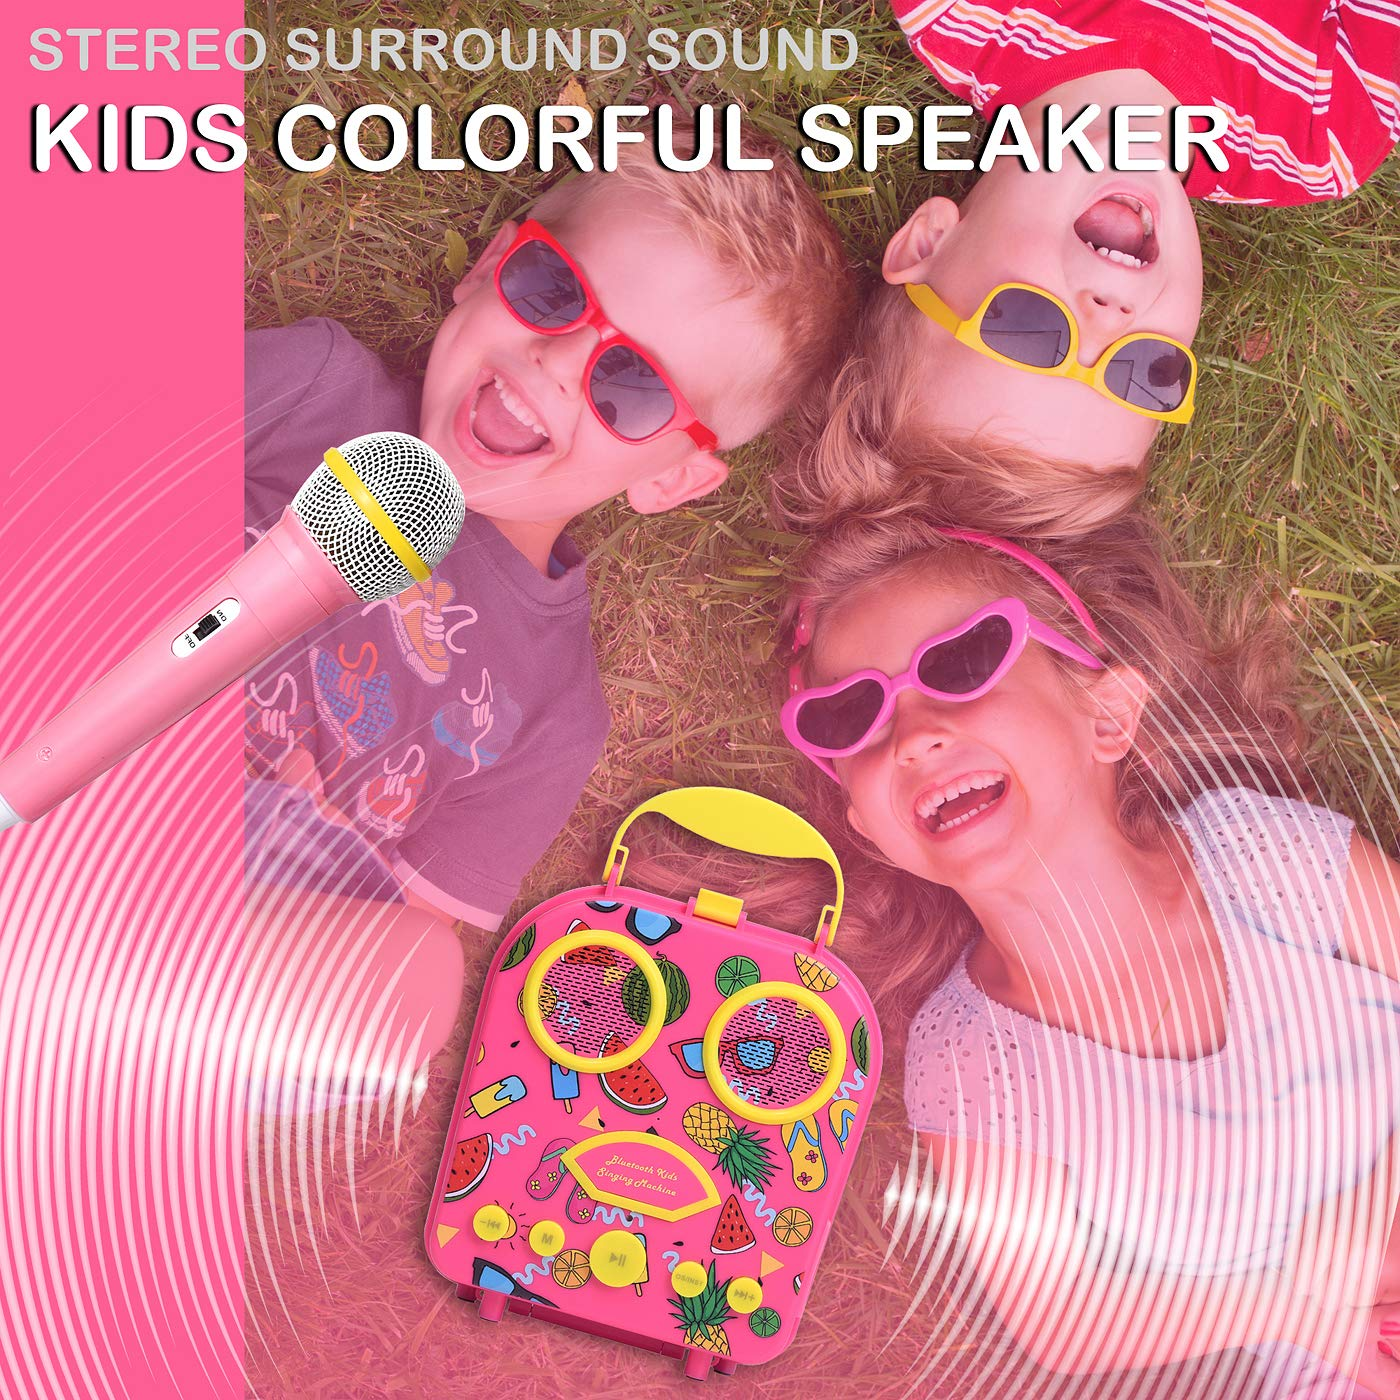 Bluetooth Speaker Children's Karaoke Speaker Portable Microphone Beach Handbag Karaoke Bluetooth Speaker Wireless Cartoon Speaker for Kids for Indoor Outdoor Travel Activities with Microphone (Pink) by HowQ (Image #5)